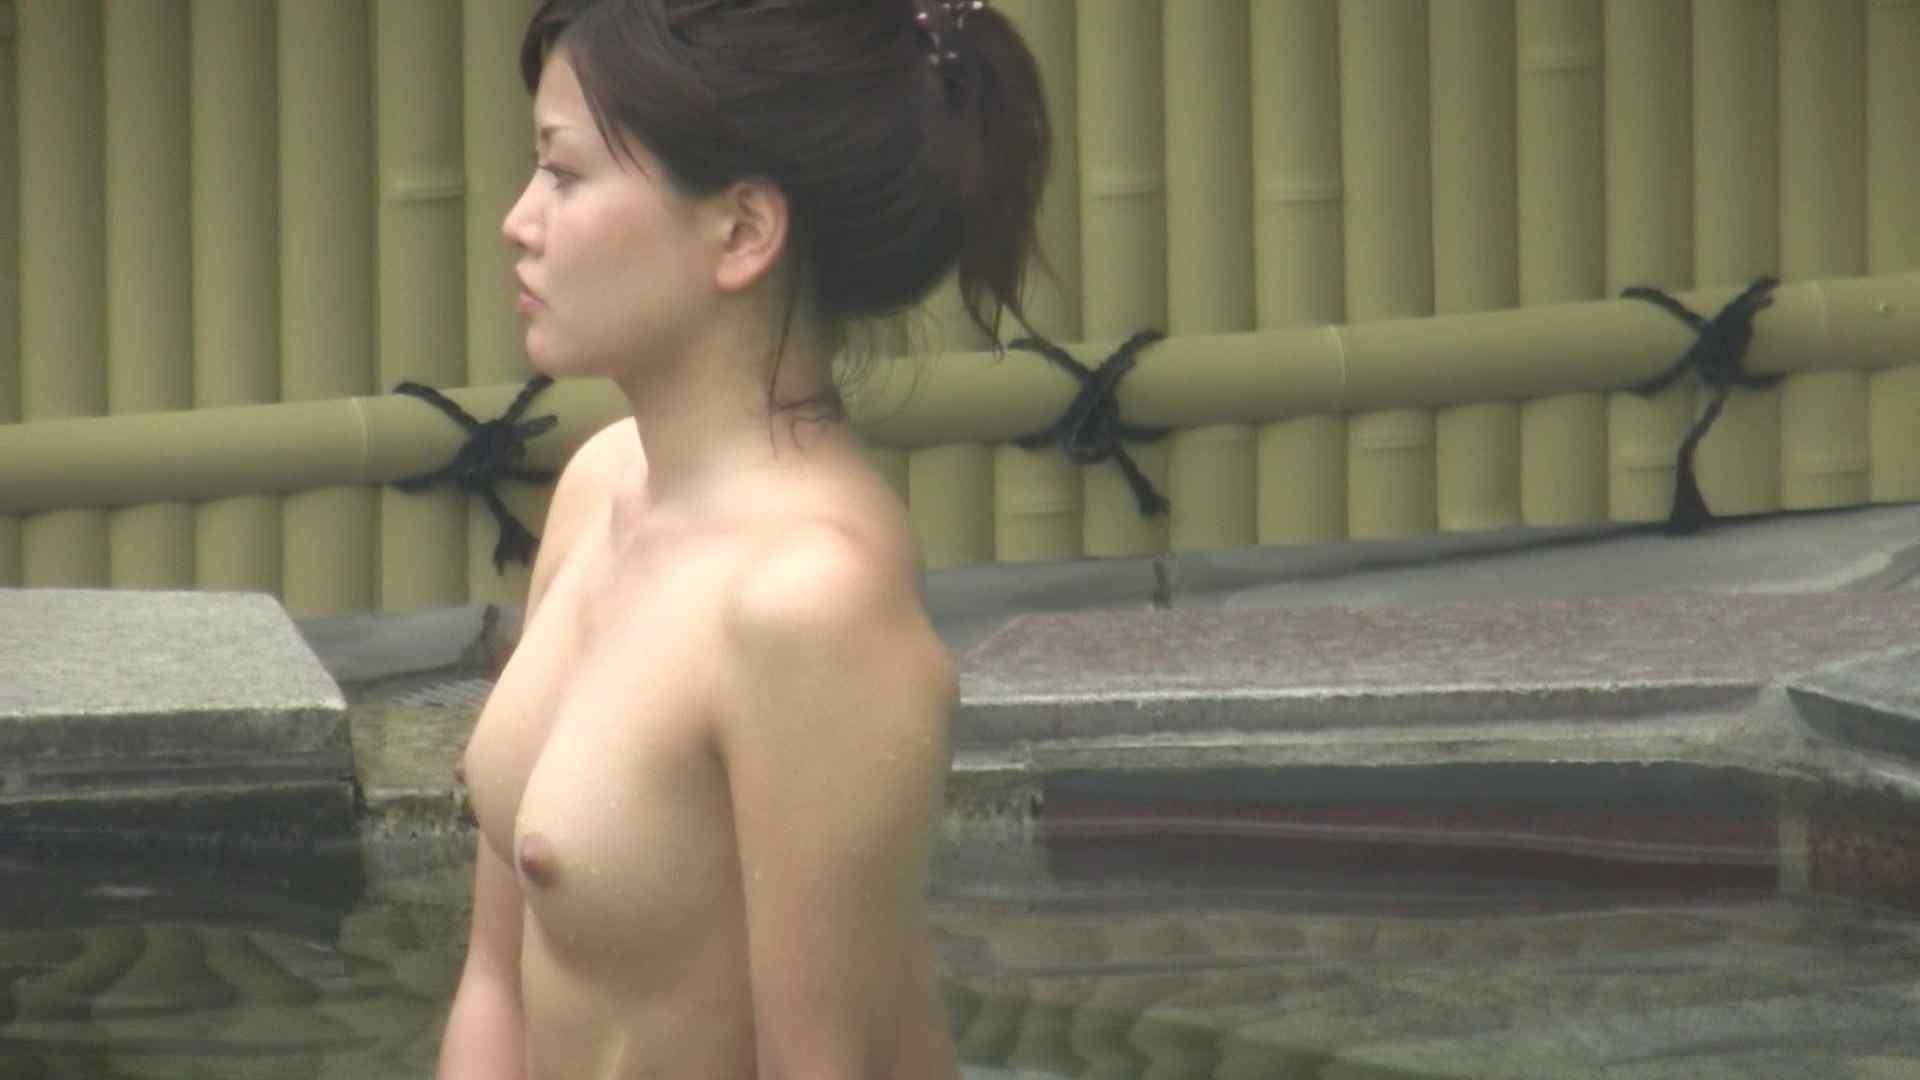 Aquaな露天風呂Vol.125 露天  88連発 41